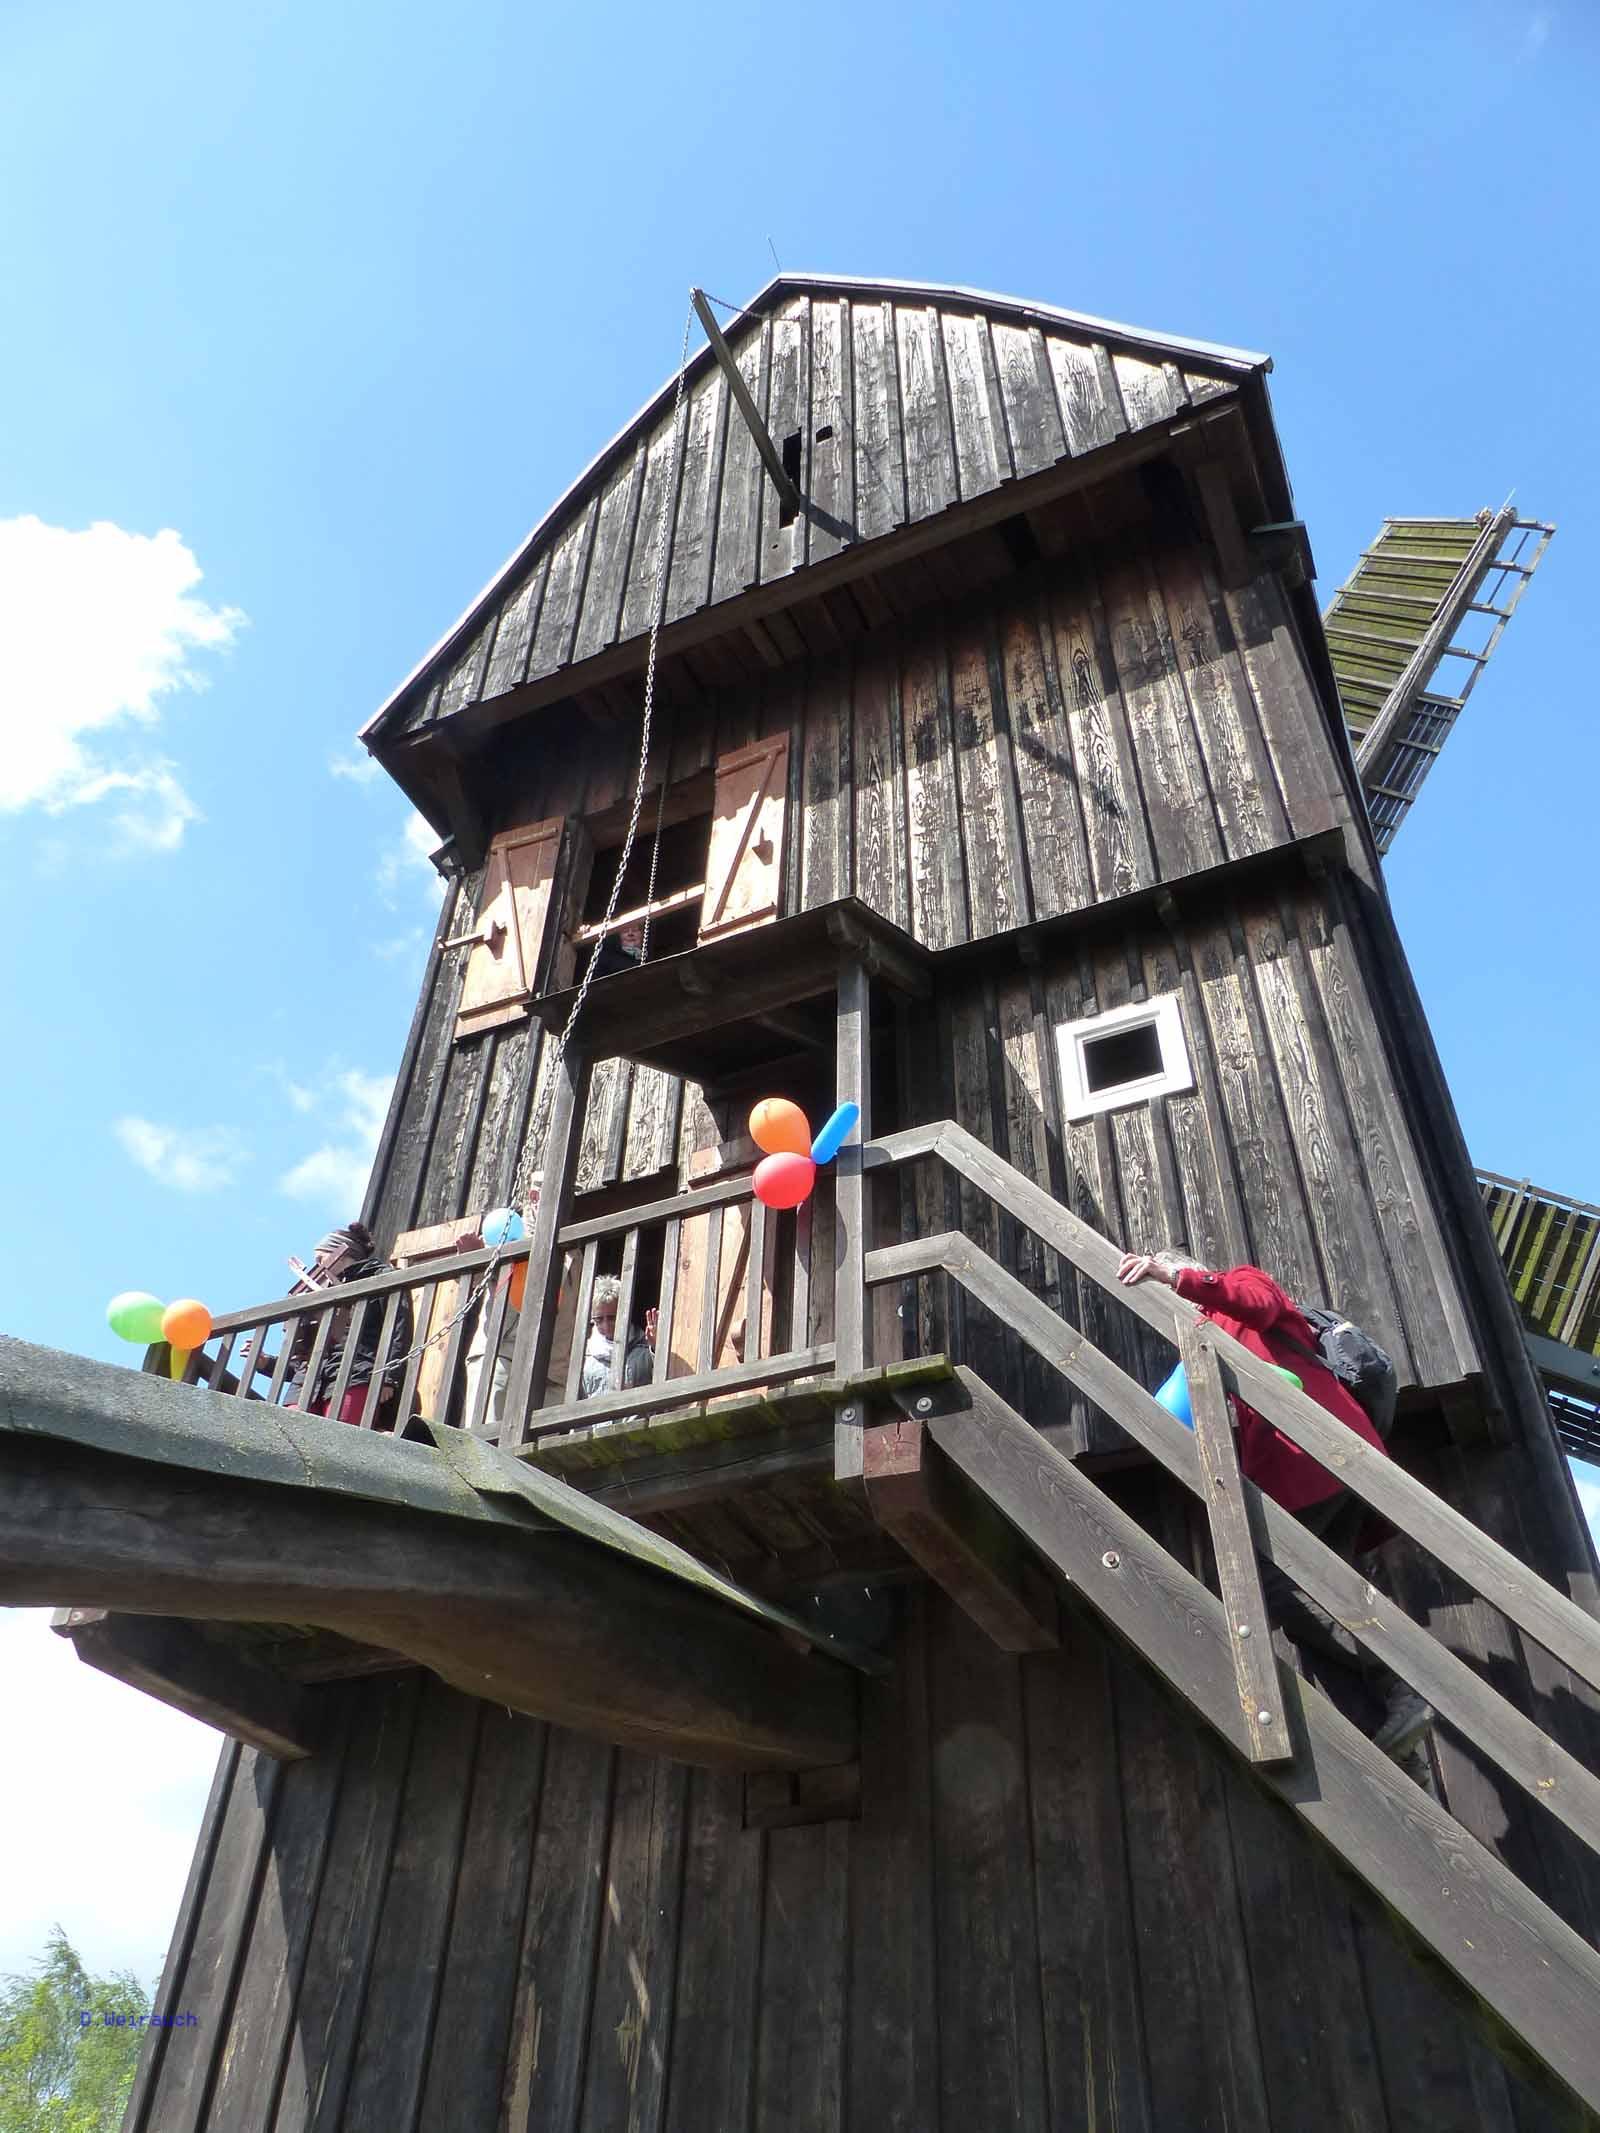 Bockwindmühle in Cammer bei Bad Belzig